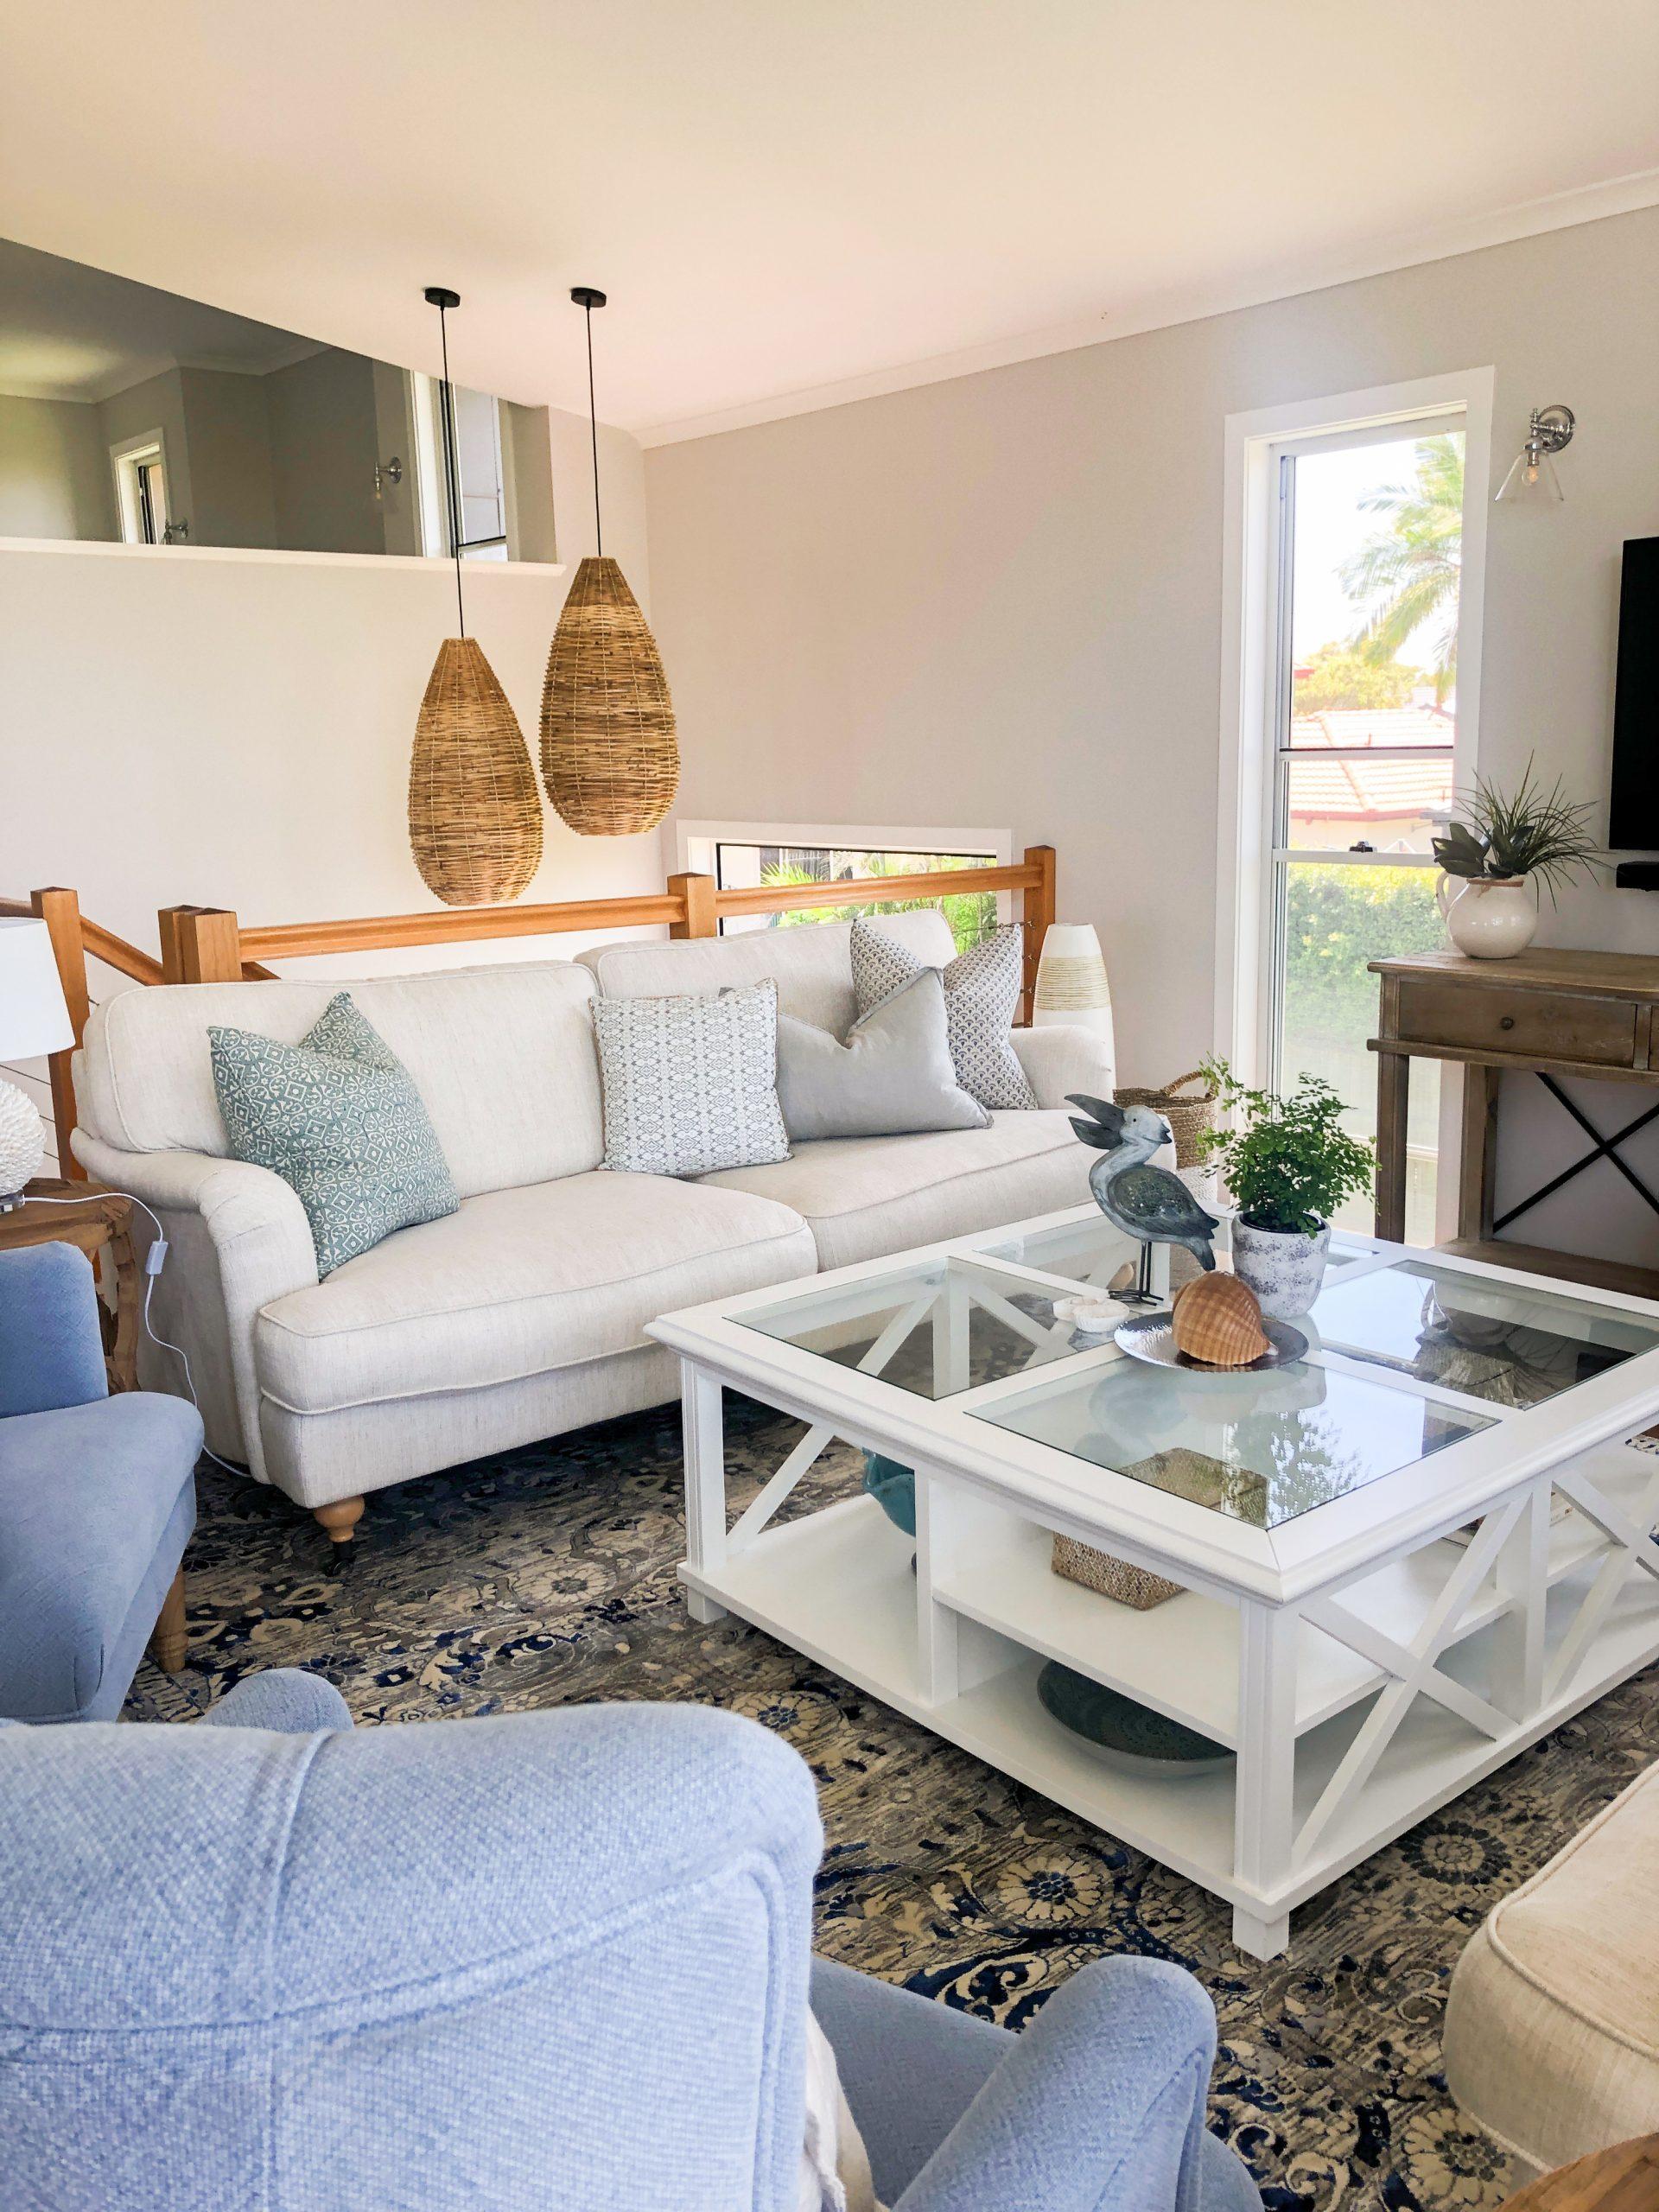 https://www.ivyandfinch.com.au/wp-content/uploads/2021/02/Redland-Bay-Interior-Design-Hampton-Living-Room-scaled.jpg